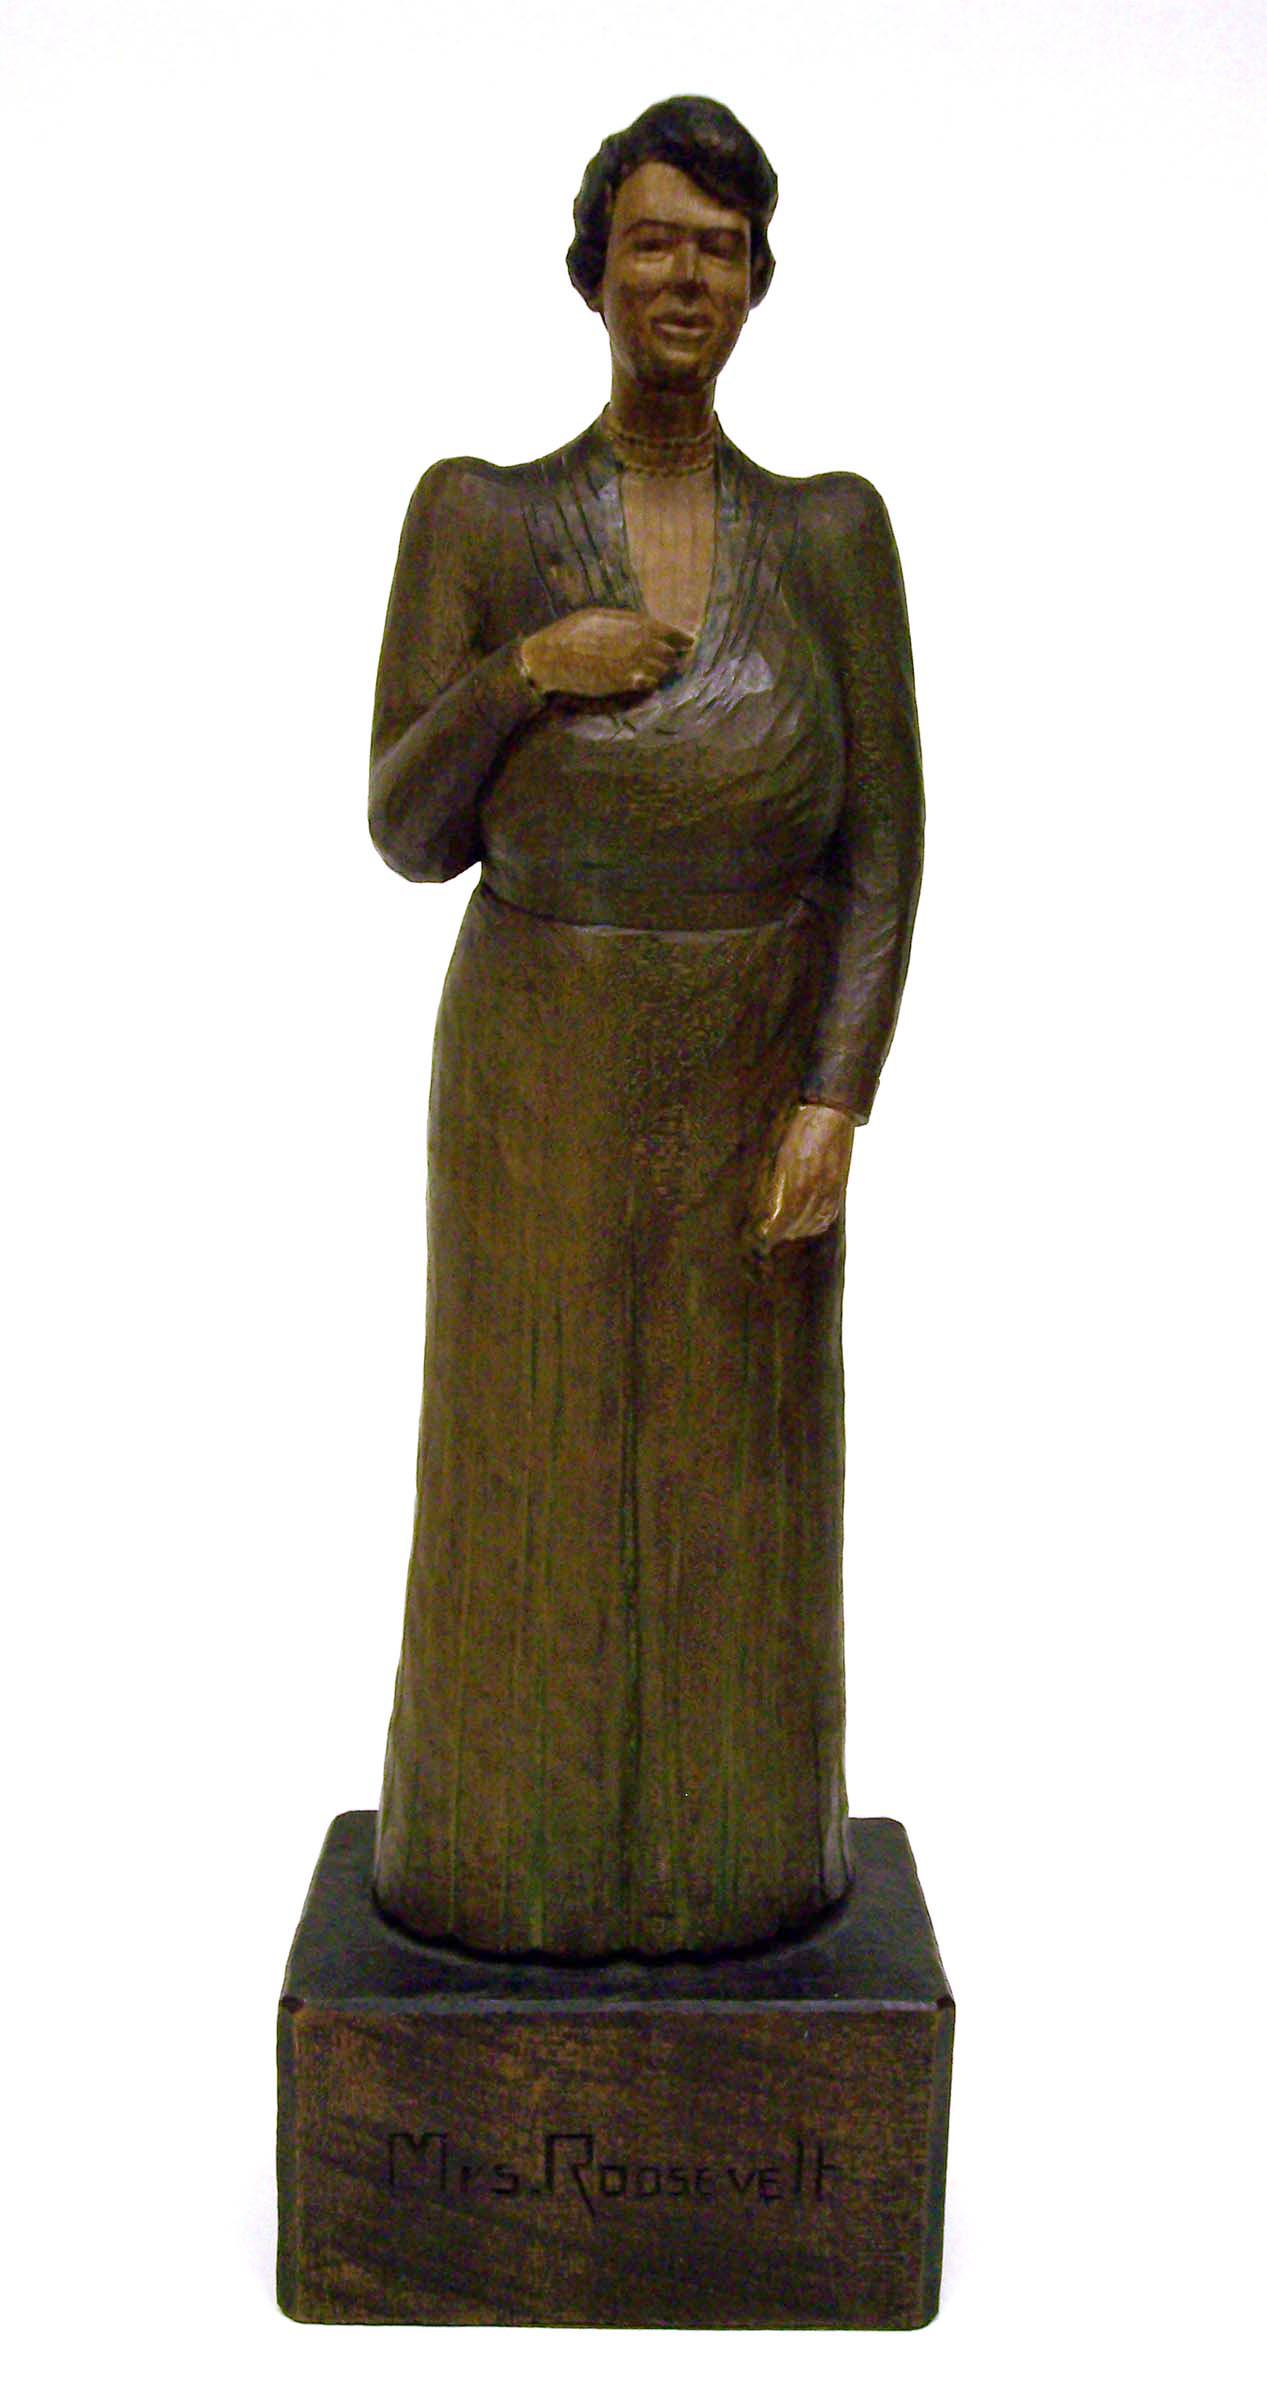 Statuette of Eleanor Roosevelt